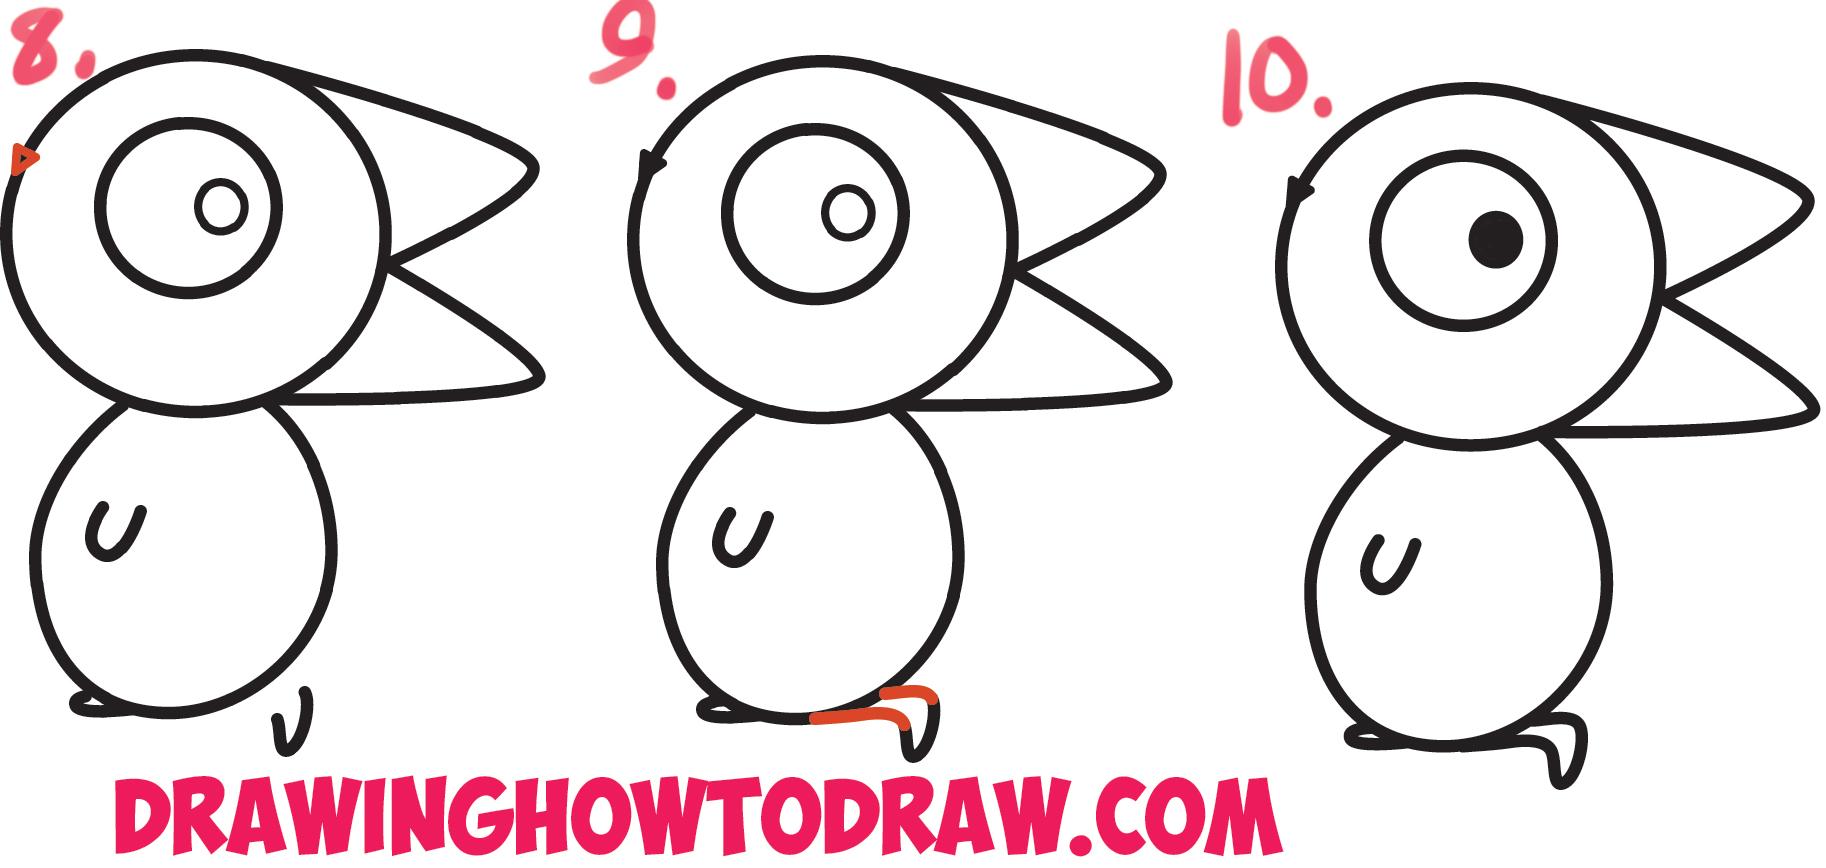 Drawn rock optical illusion Cat How